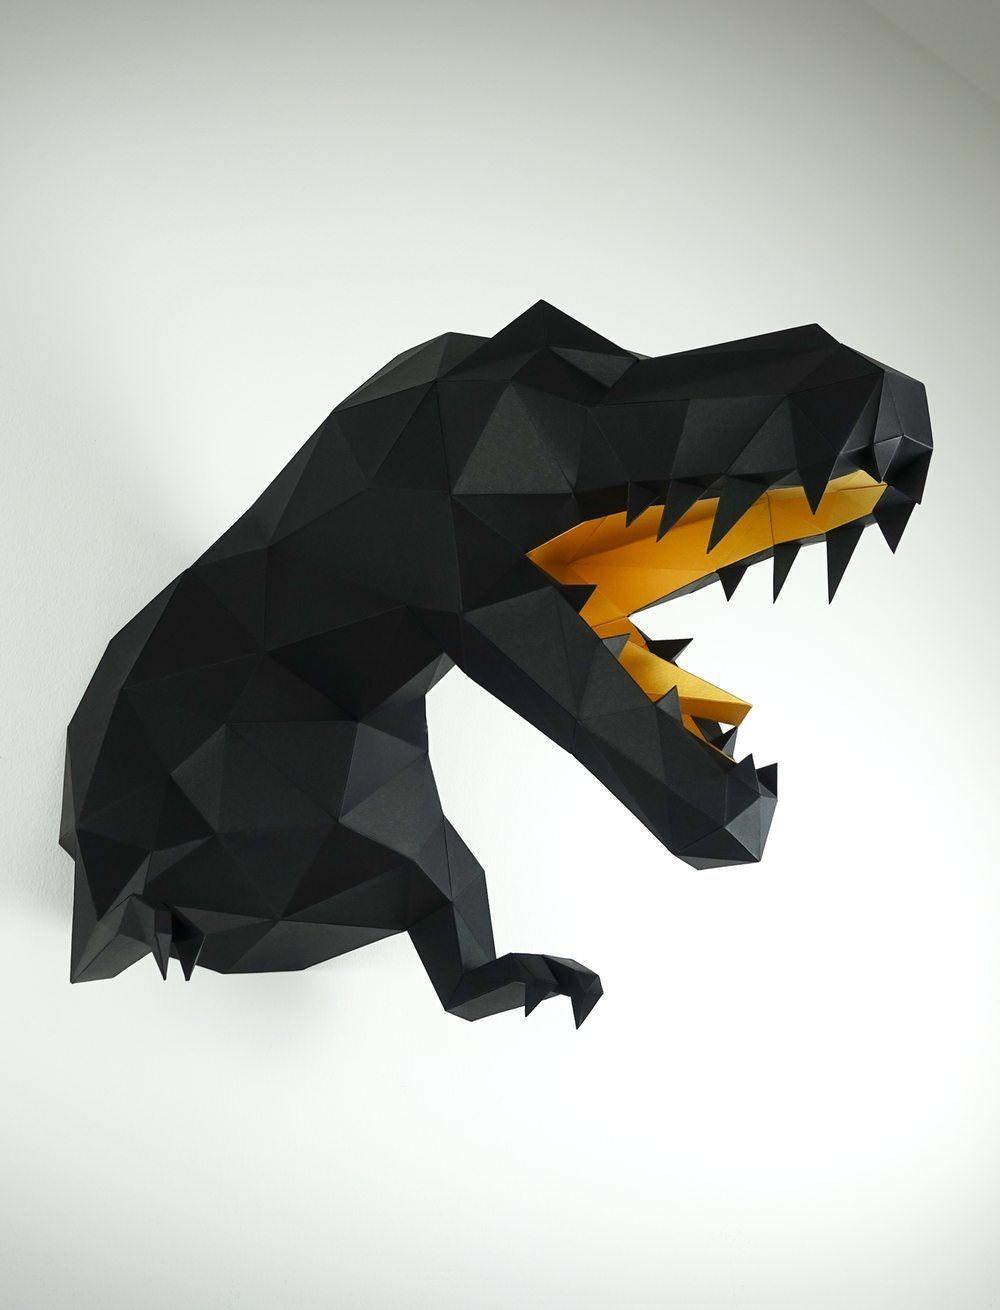 Dinosaur Papercraft Trex Wanddekoration Wandtrophäe